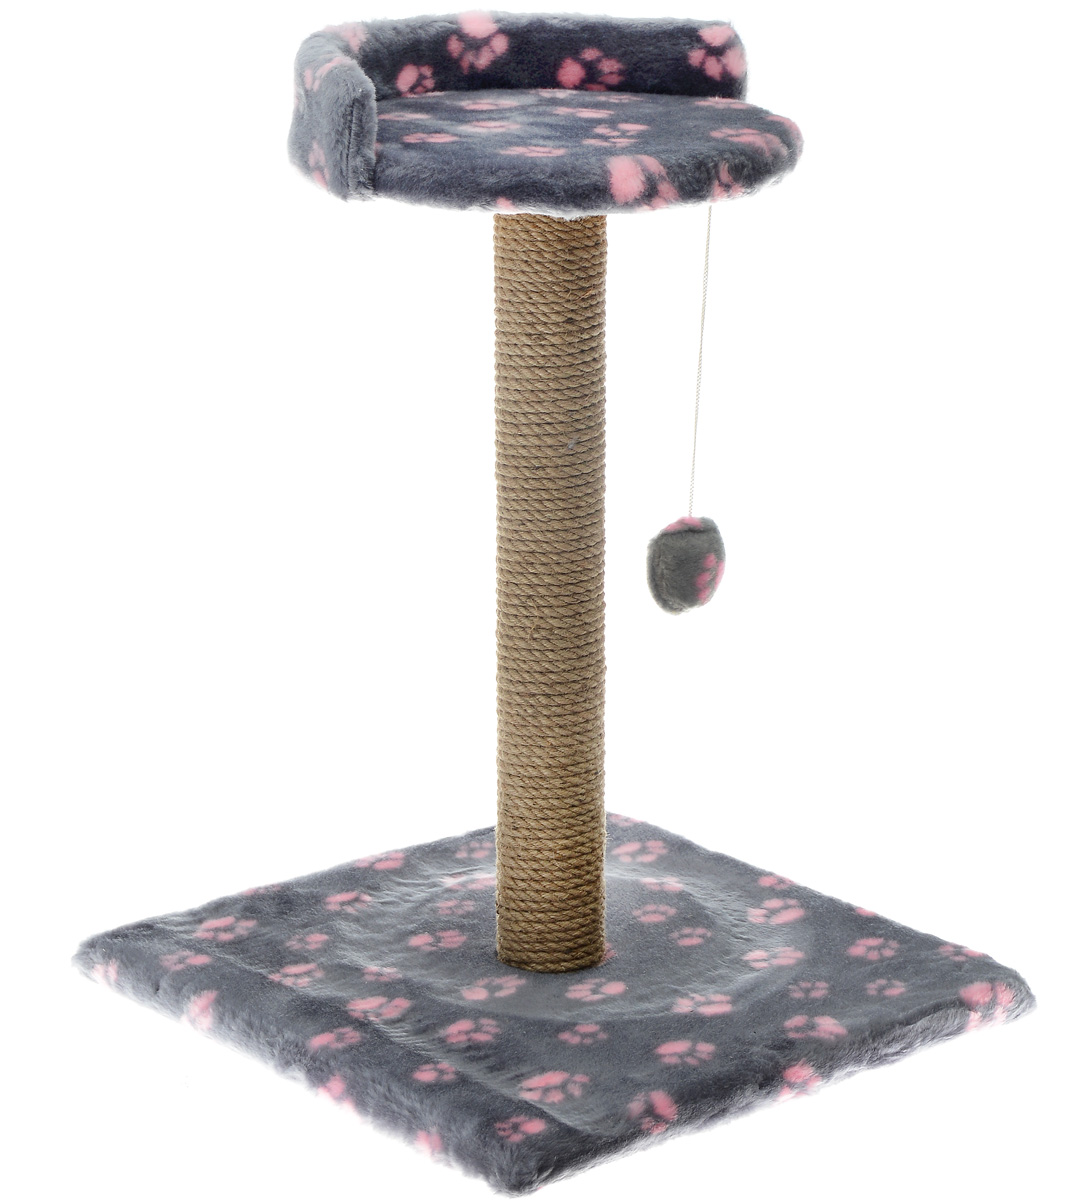 "Когтеточка Меридиан ""Арена"", цвет: темно-серый, розовый, 41 х 41 х 59 см"